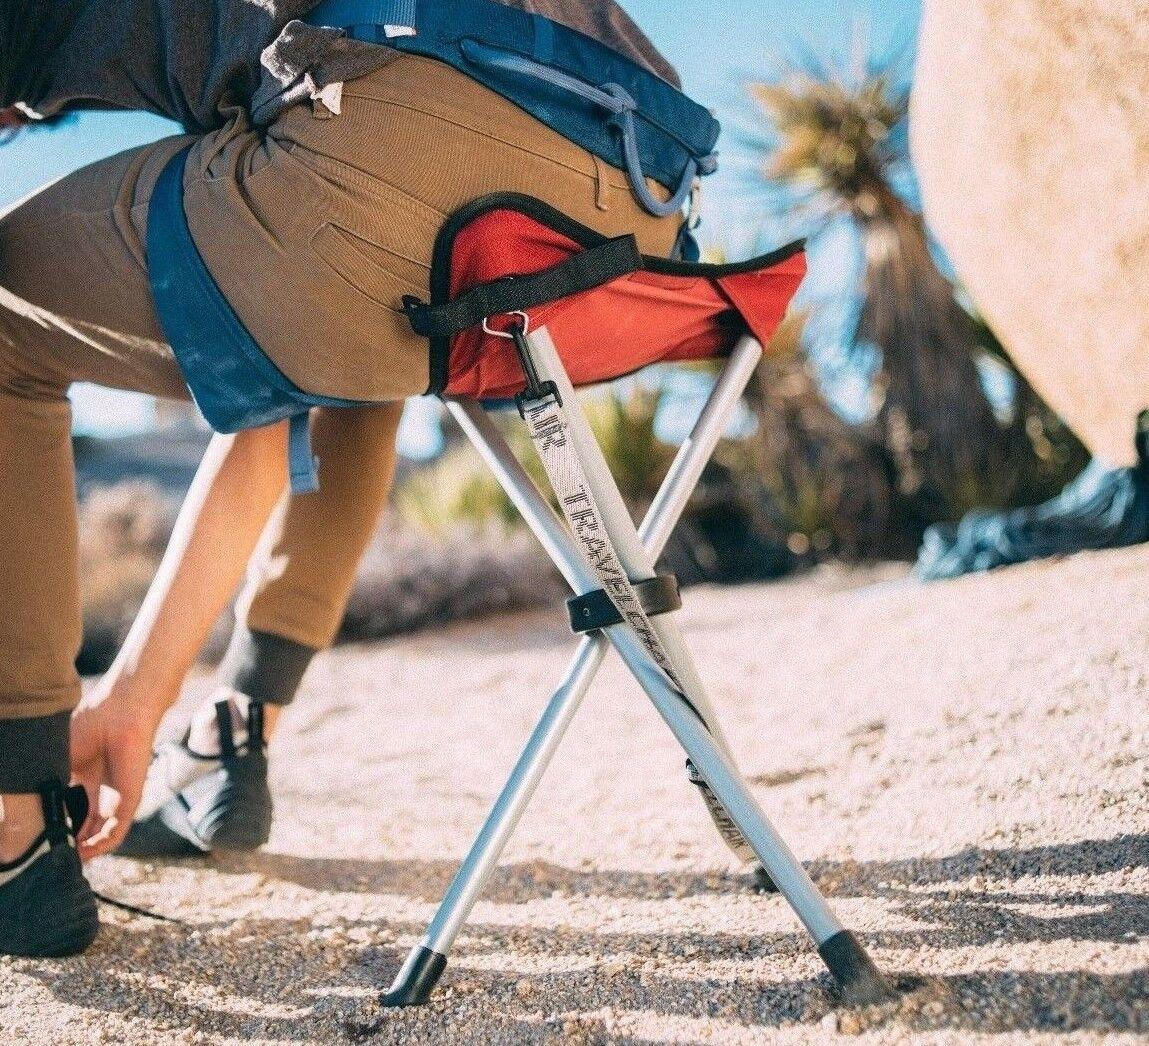 TravelChair 1389VR Camping Slacker Stool Red for sale online